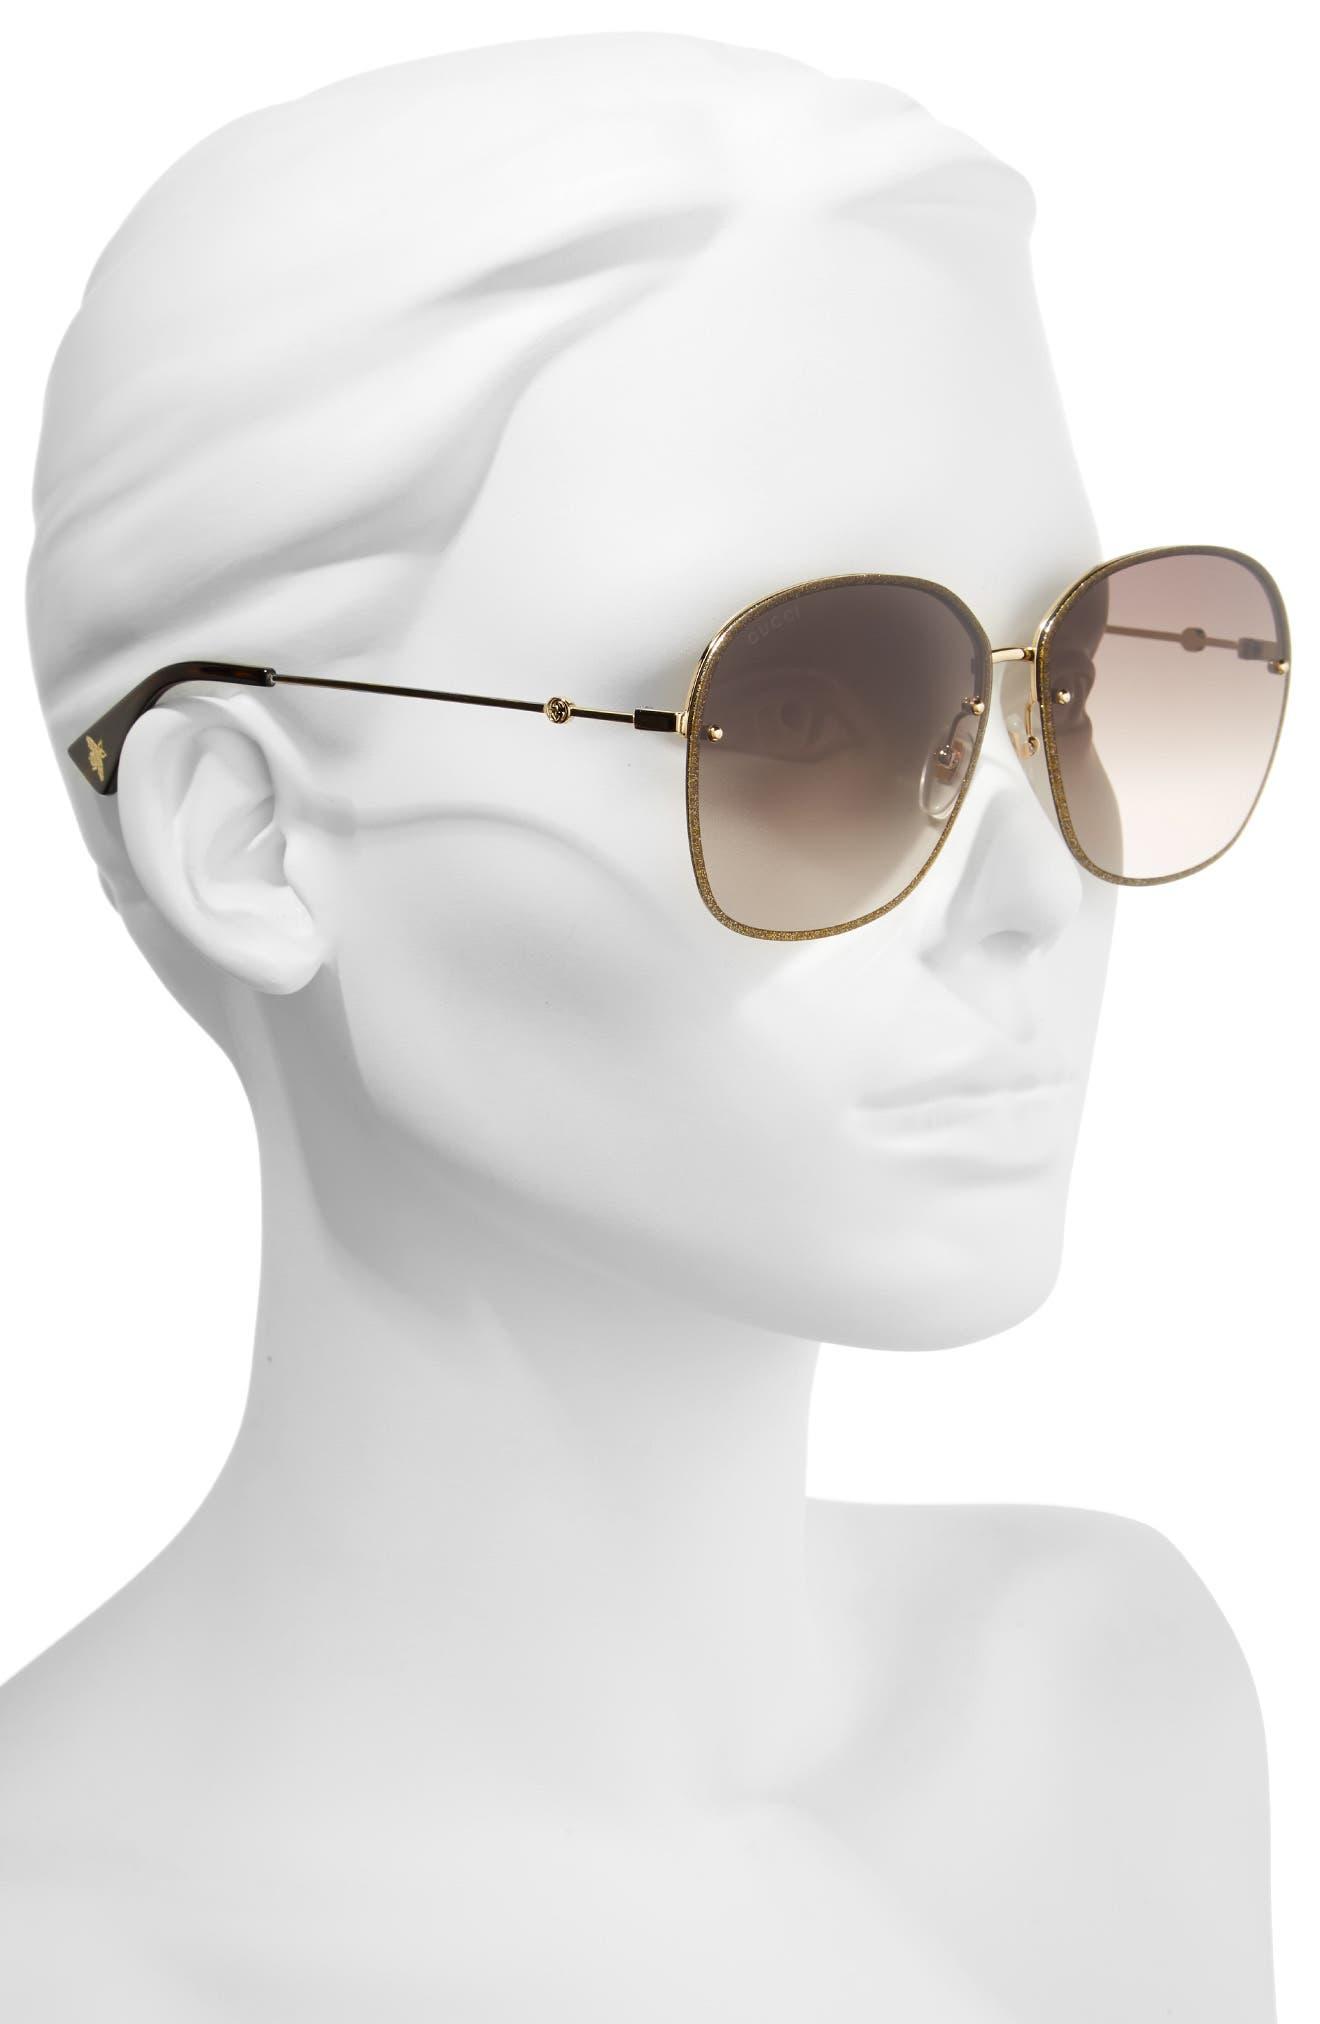 63mm Oversize Square Sunglasses,                             Alternate thumbnail 2, color,                             Gold/ Brown